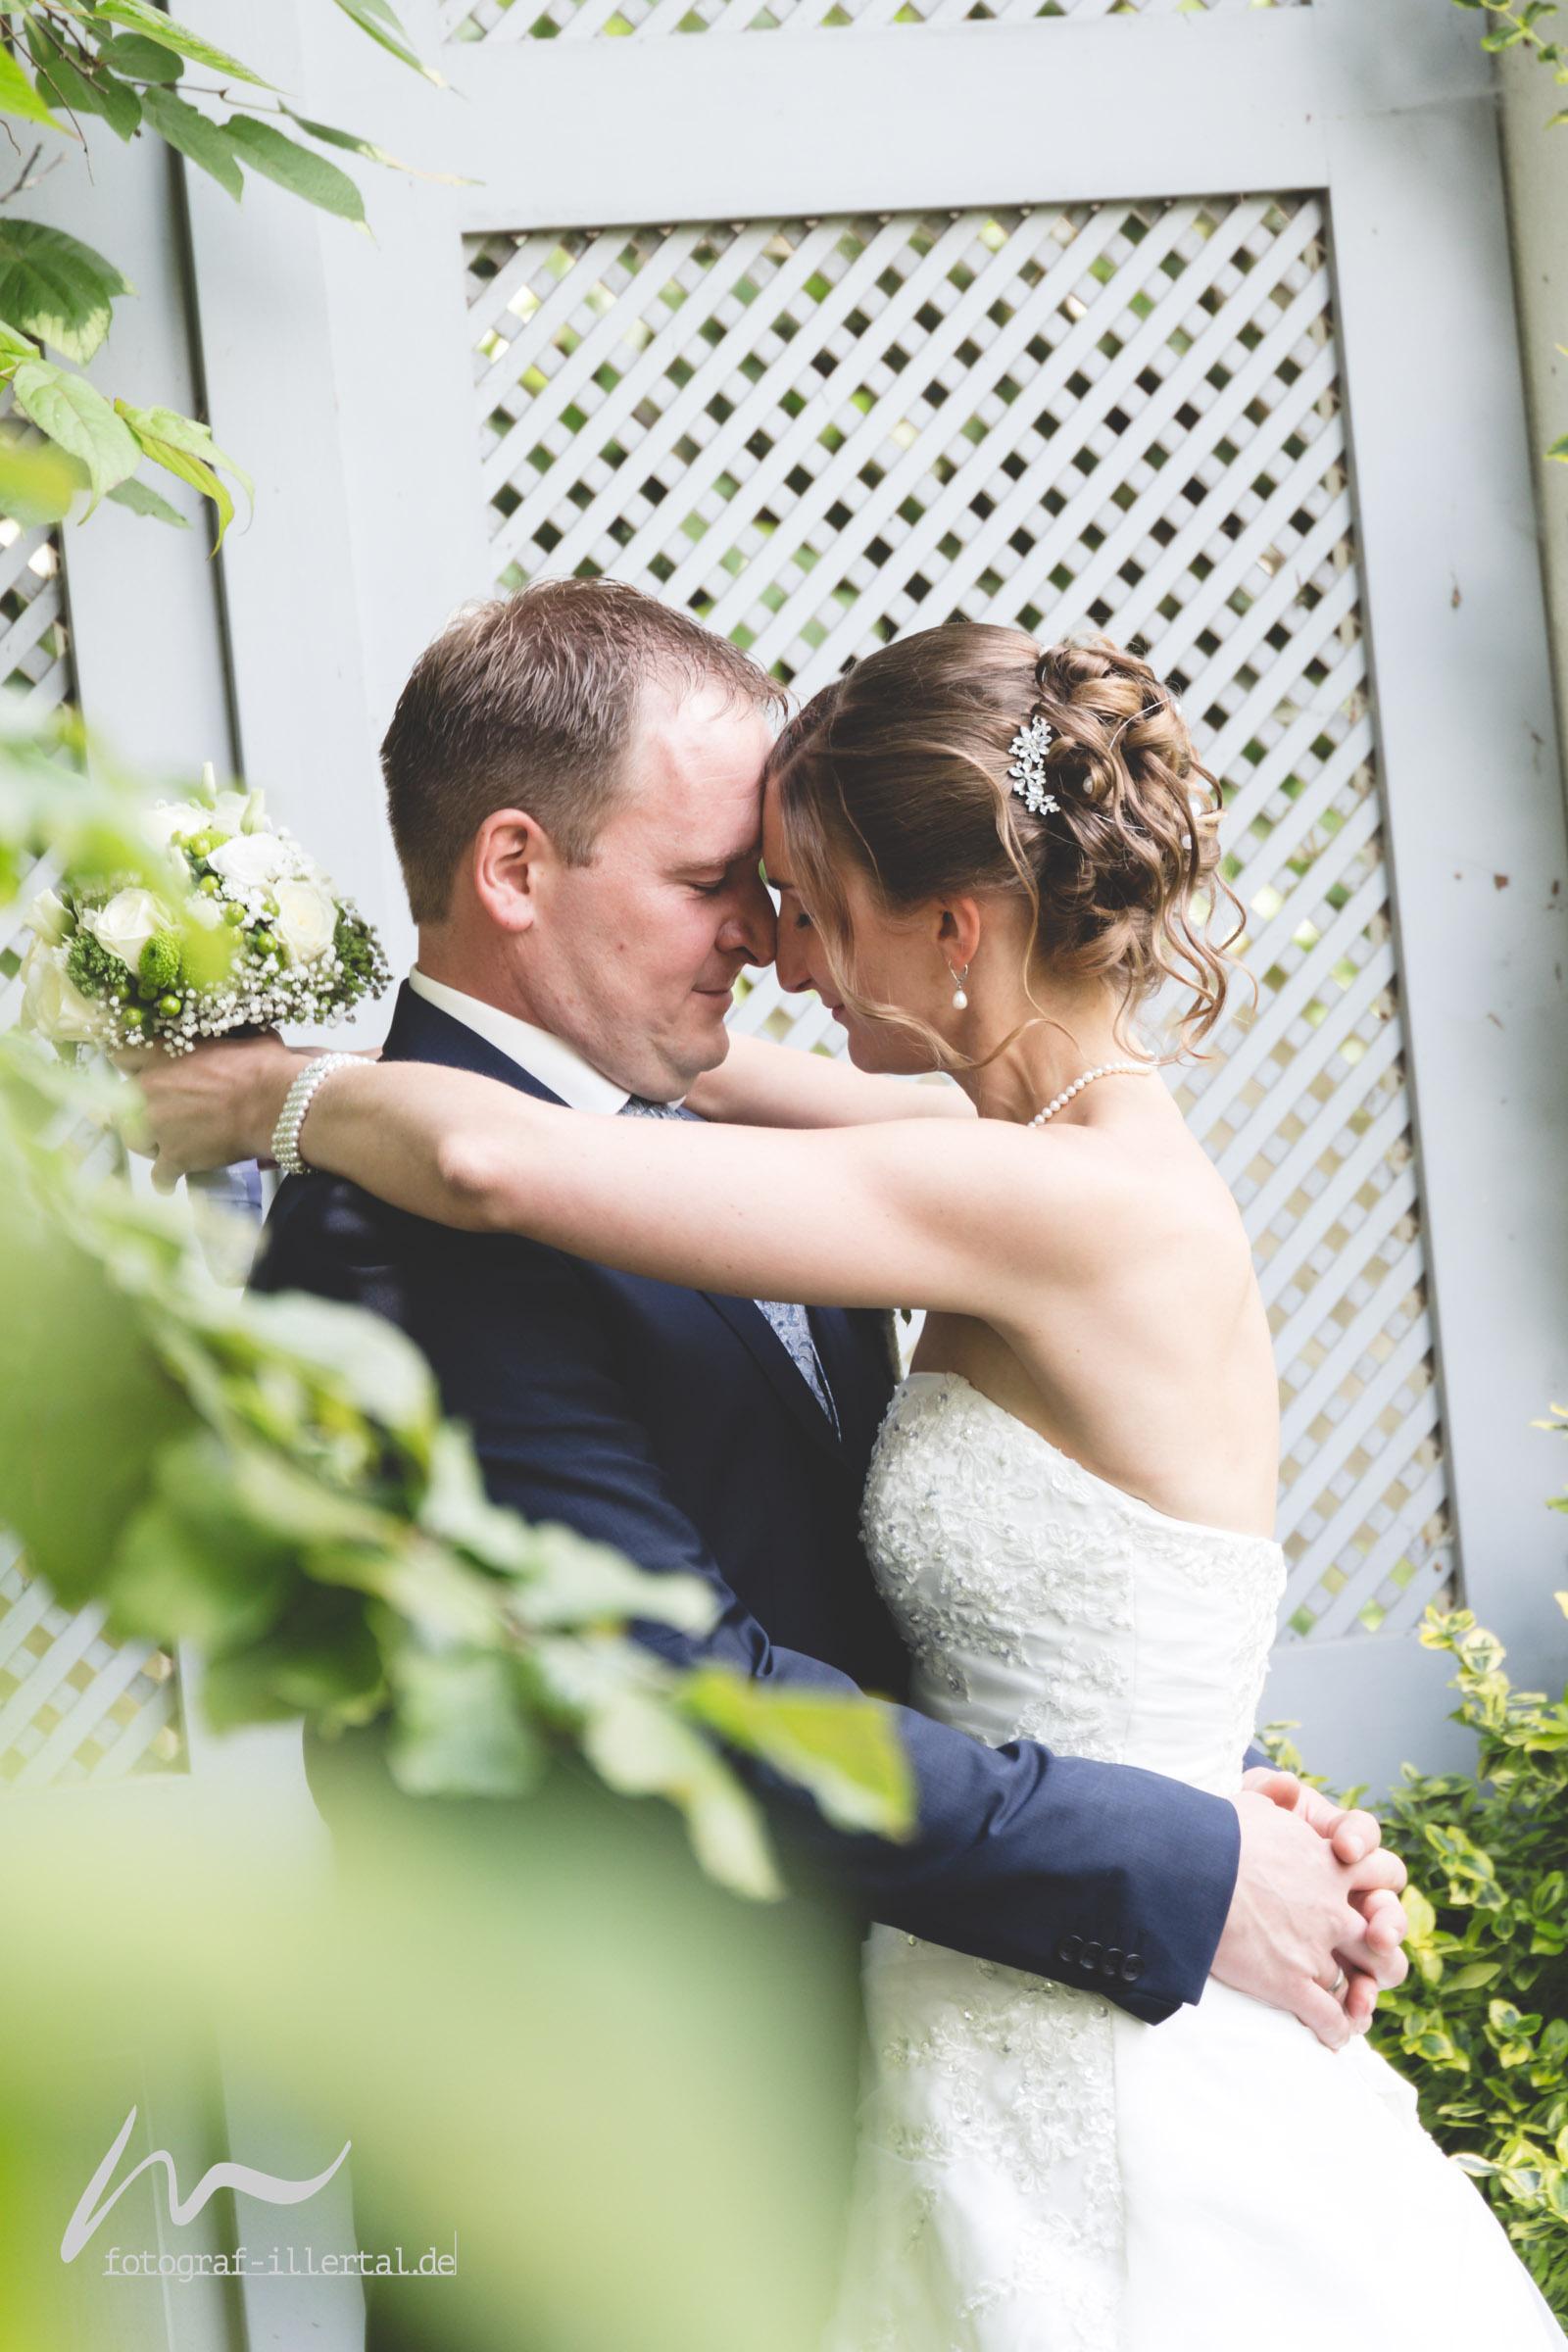 Fotograf Illertal-Christian Miller-Hochzeitsfotografie-_MG_3549